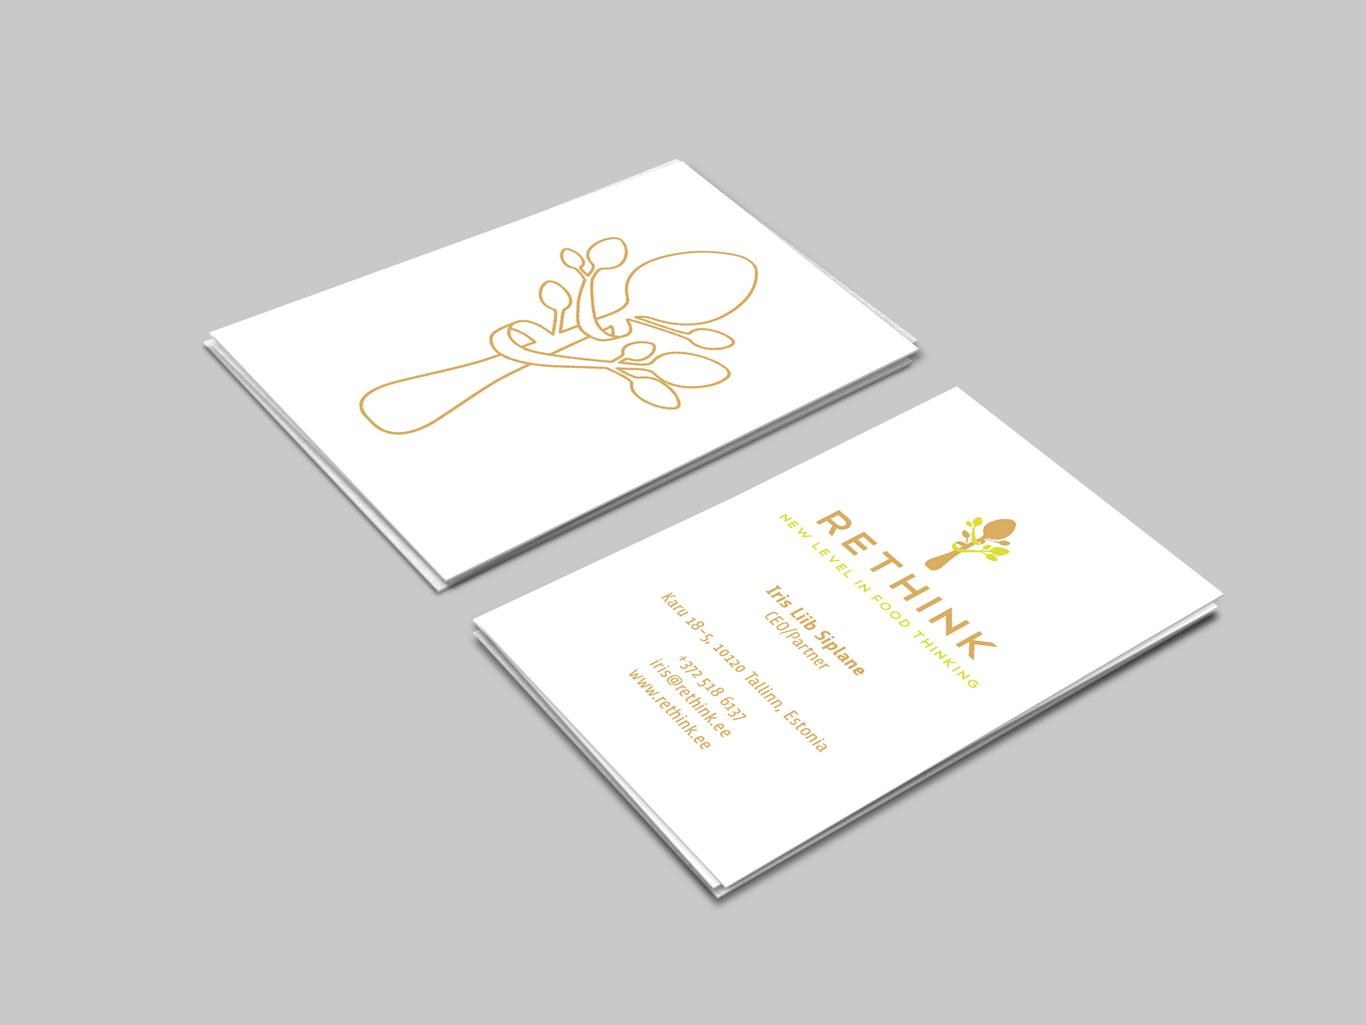 rethink-business-card-mockup